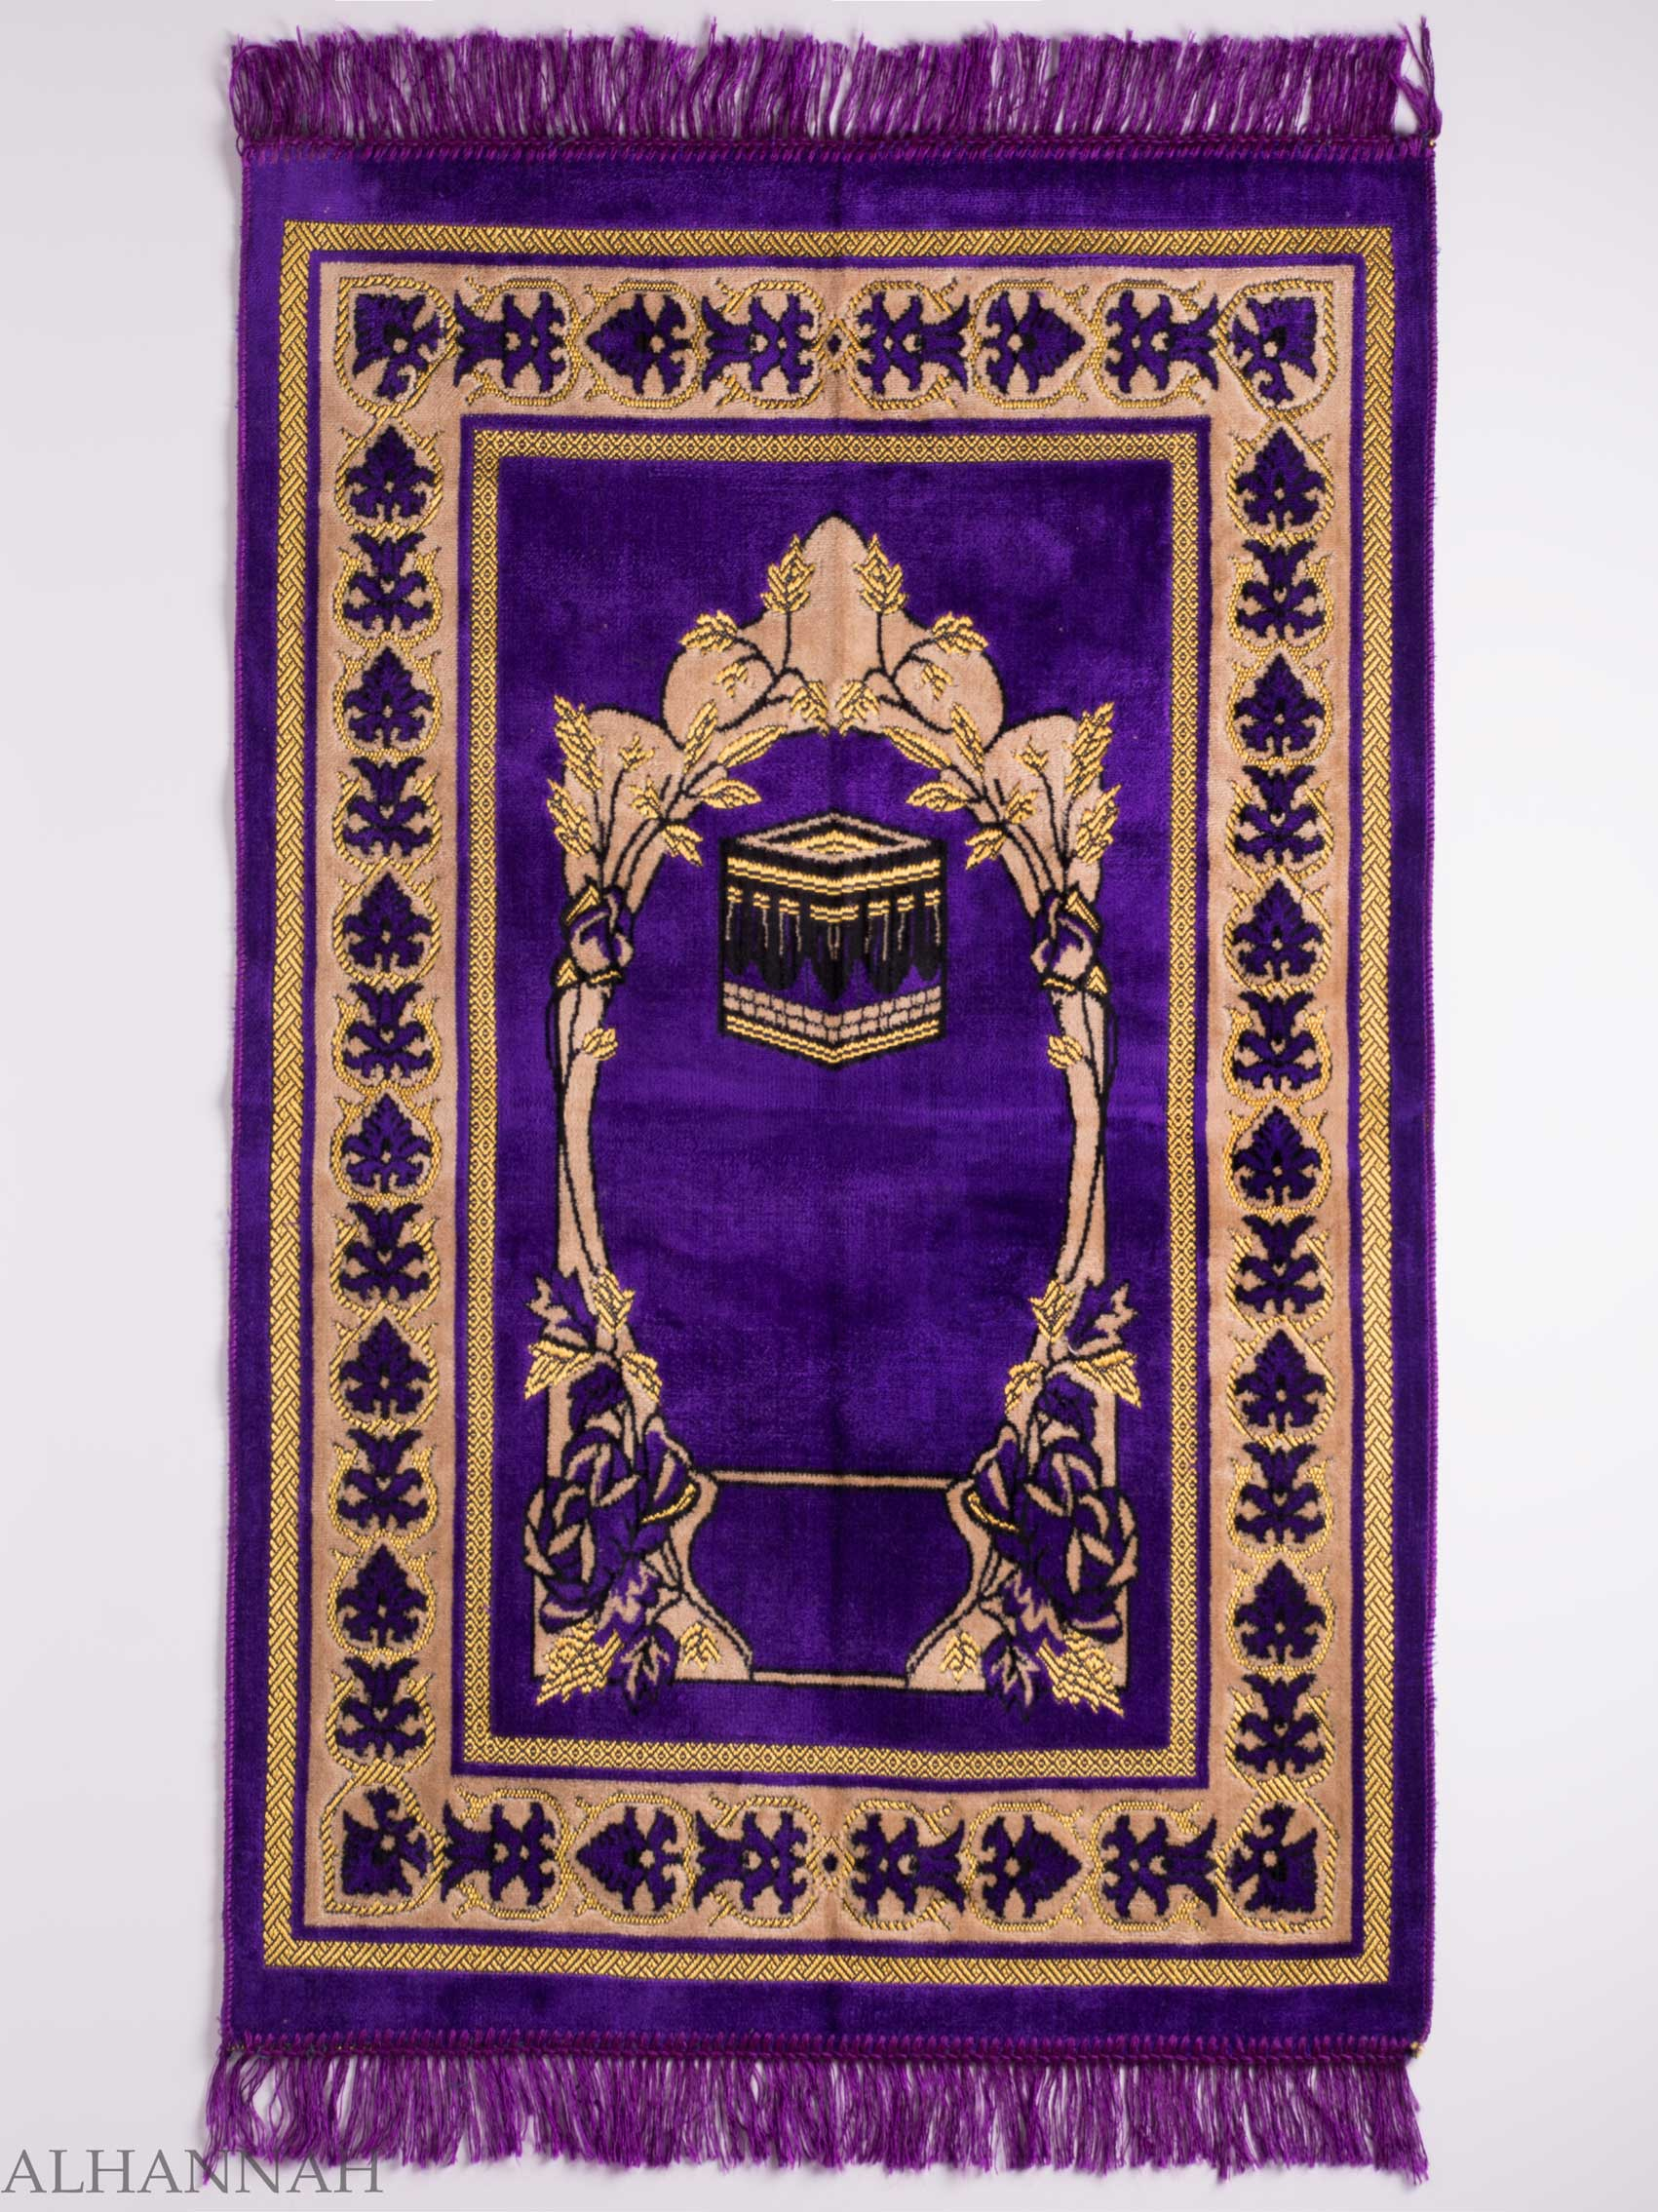 Turkish Prayer Rug Purple Arched Floral Kaaba Motif ii1128